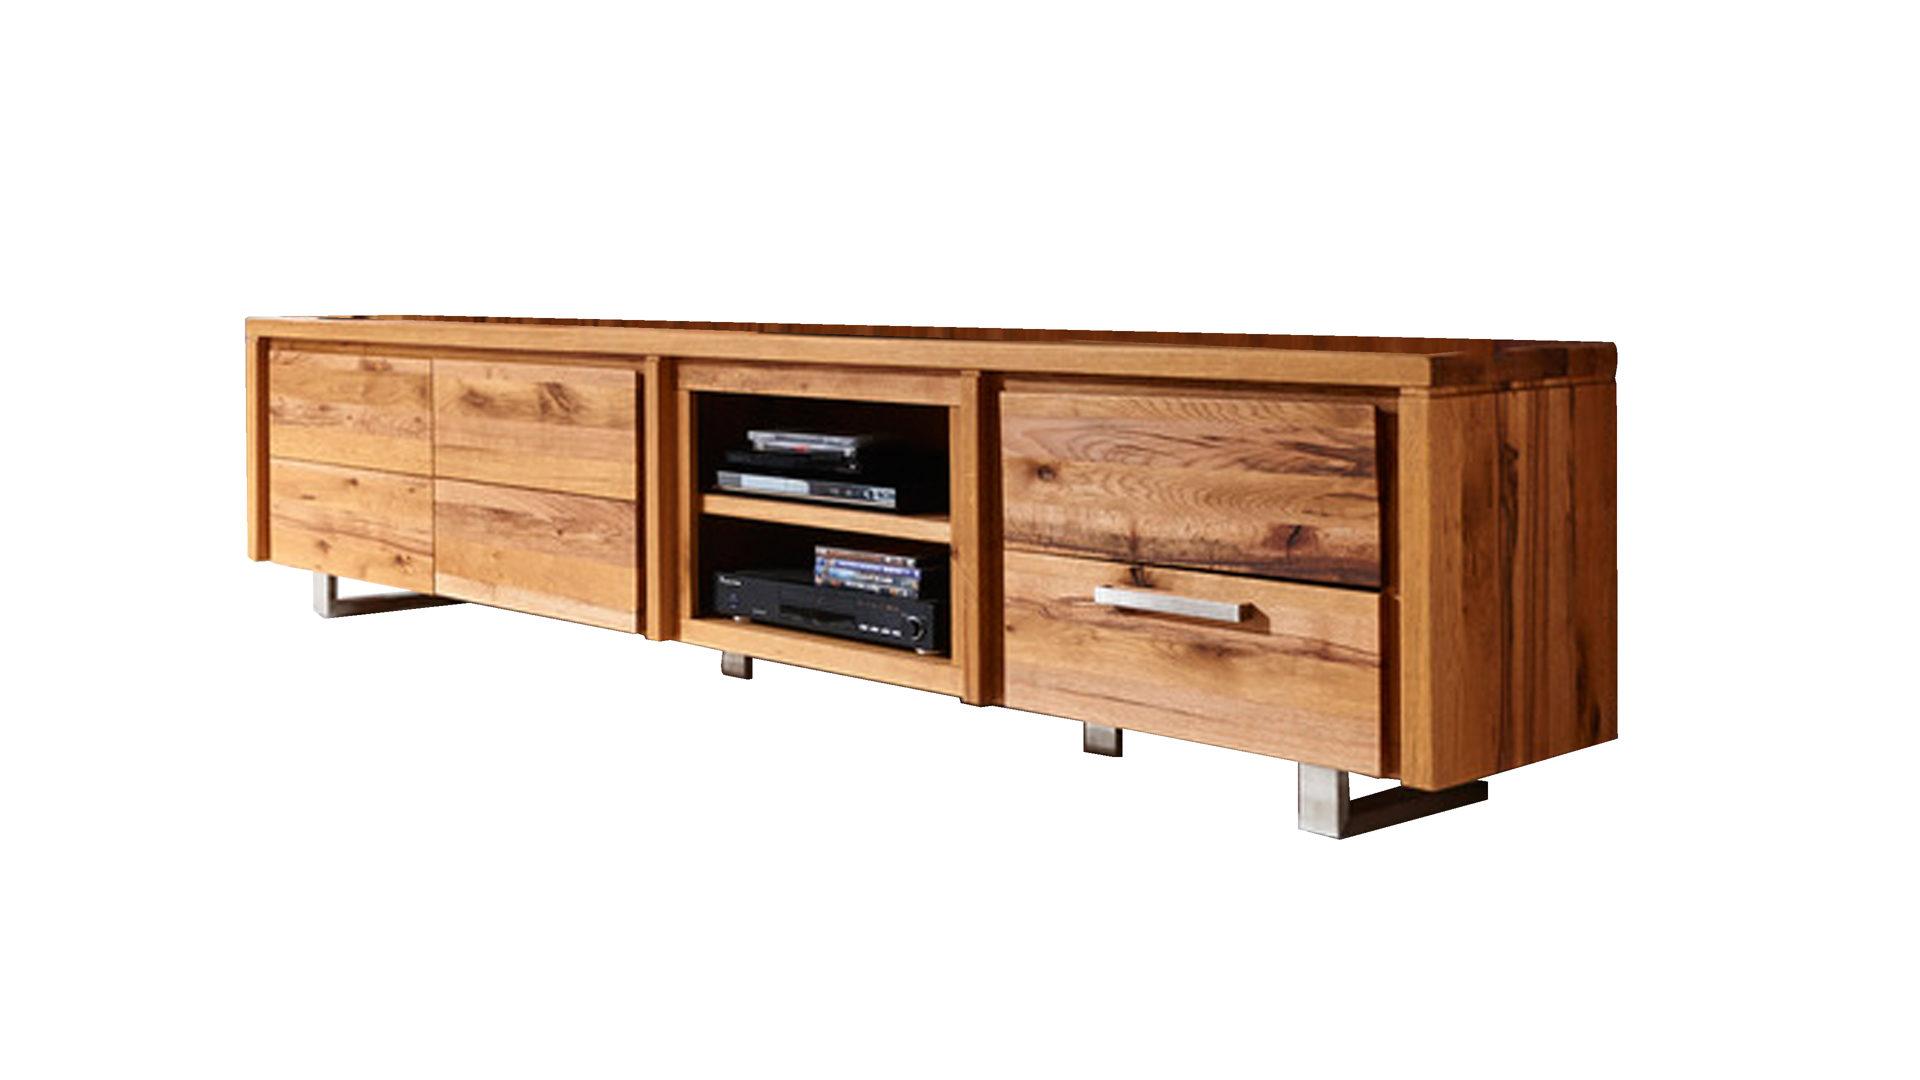 HABUFA Medien-Lowboard Masters als TV-Möbel, Vintage naturfarbene ...